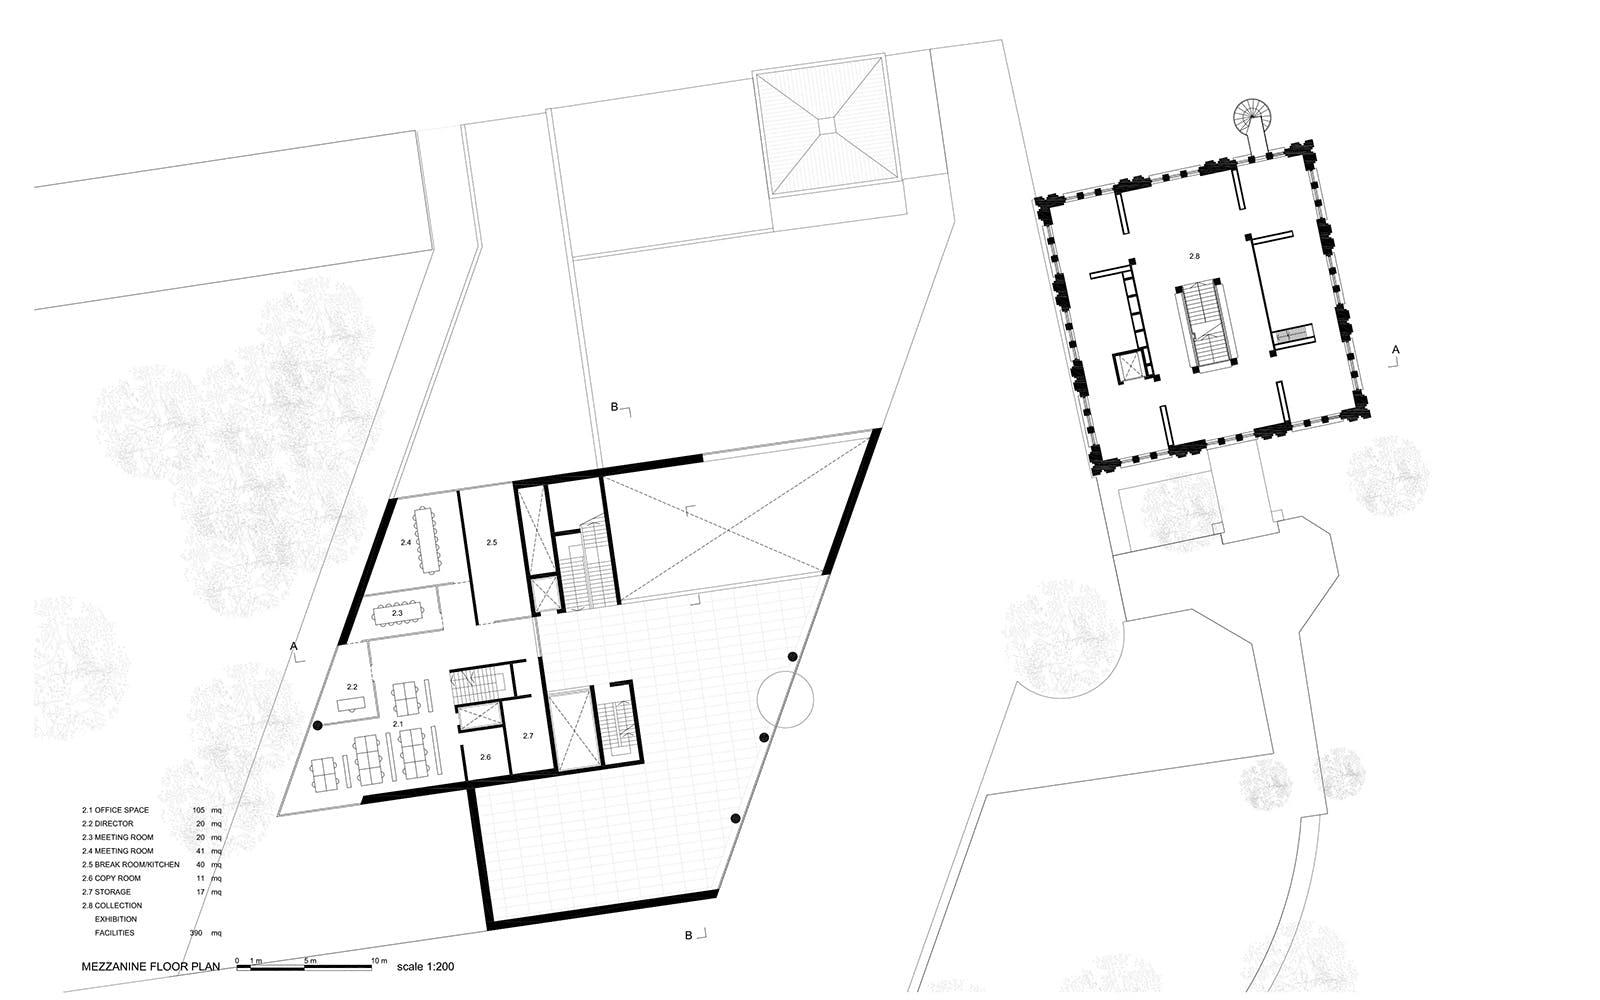 Tampere art museum and pyynikintori square carlo rivi for Mezzanine floor plan